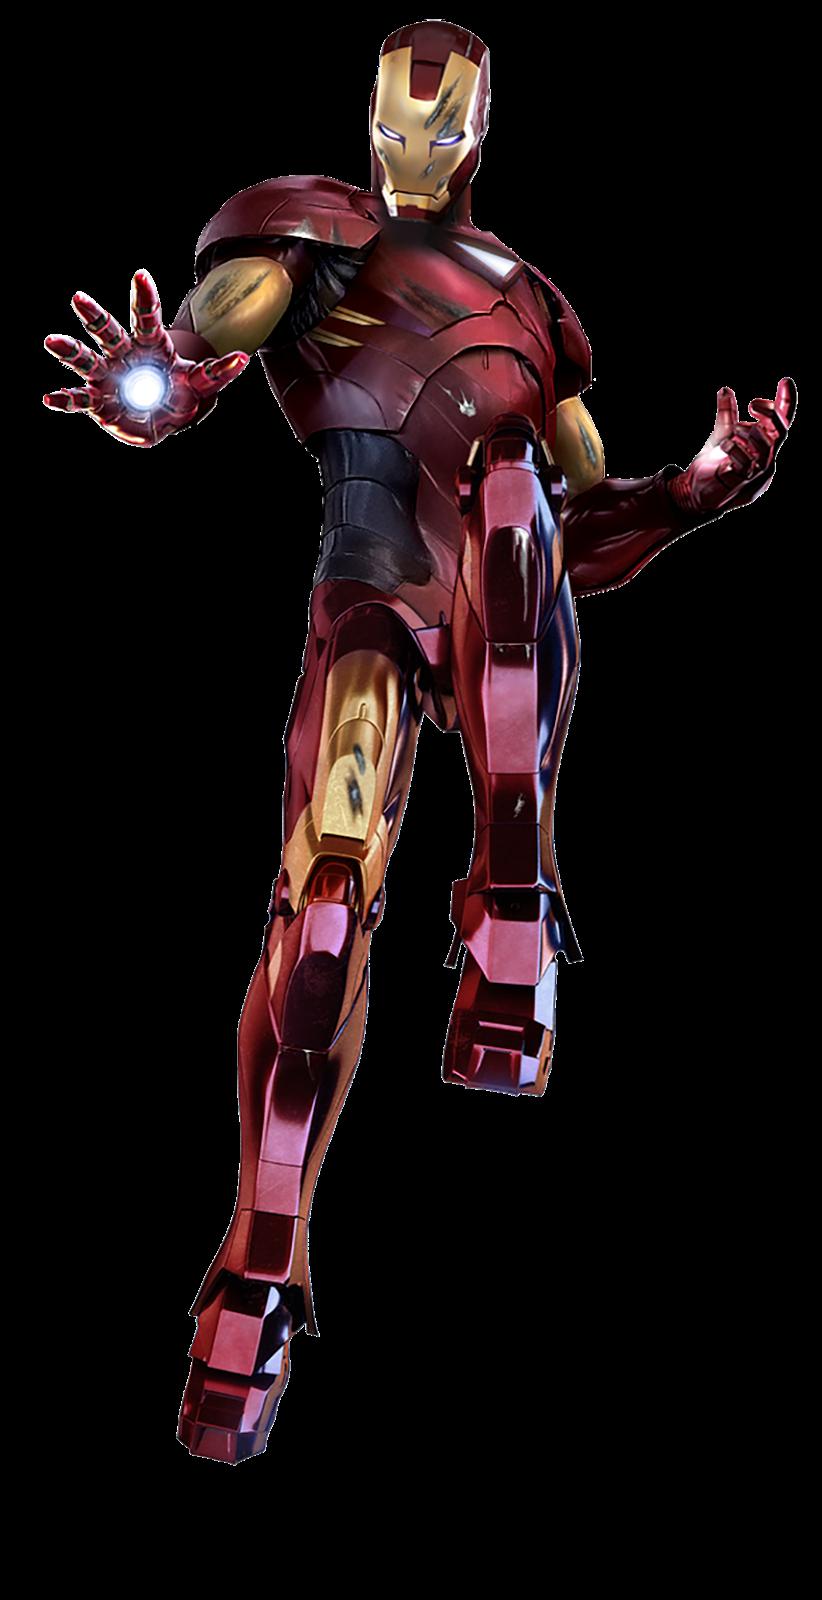 My heroe comic iron man - Iron man 1 images ...